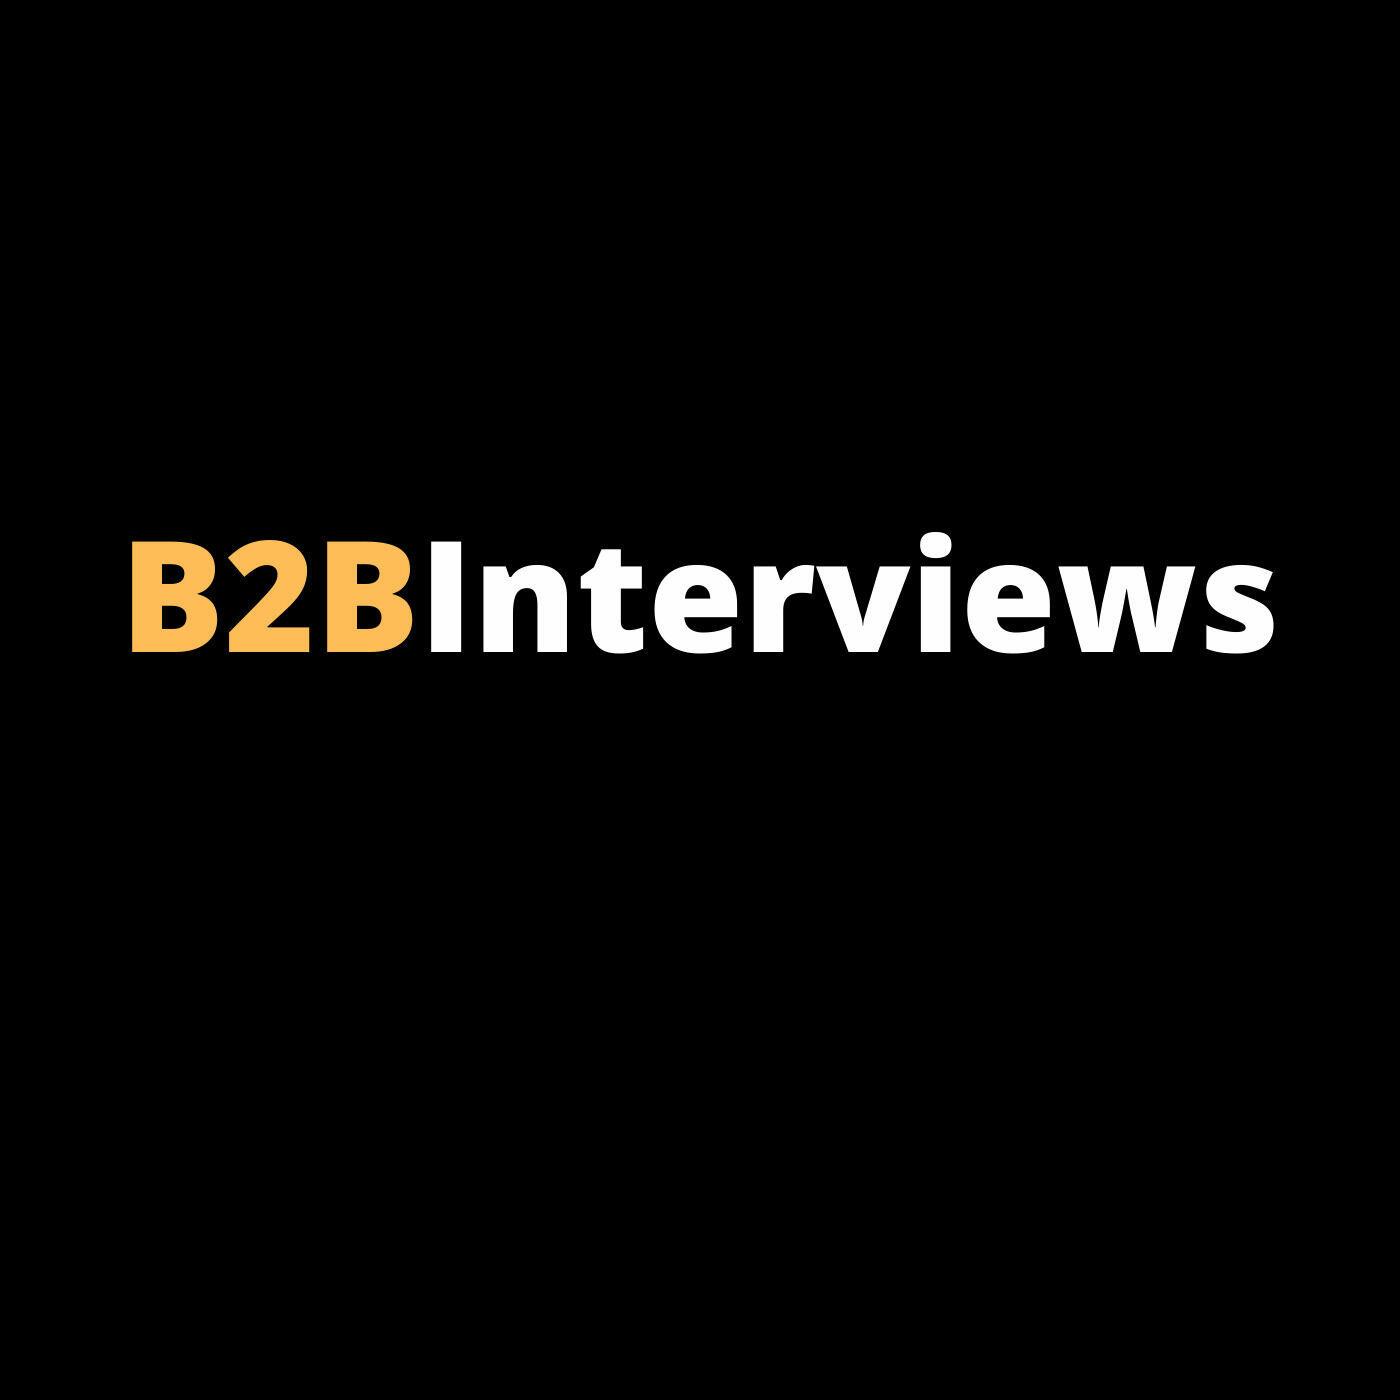 B2BInterviews.com